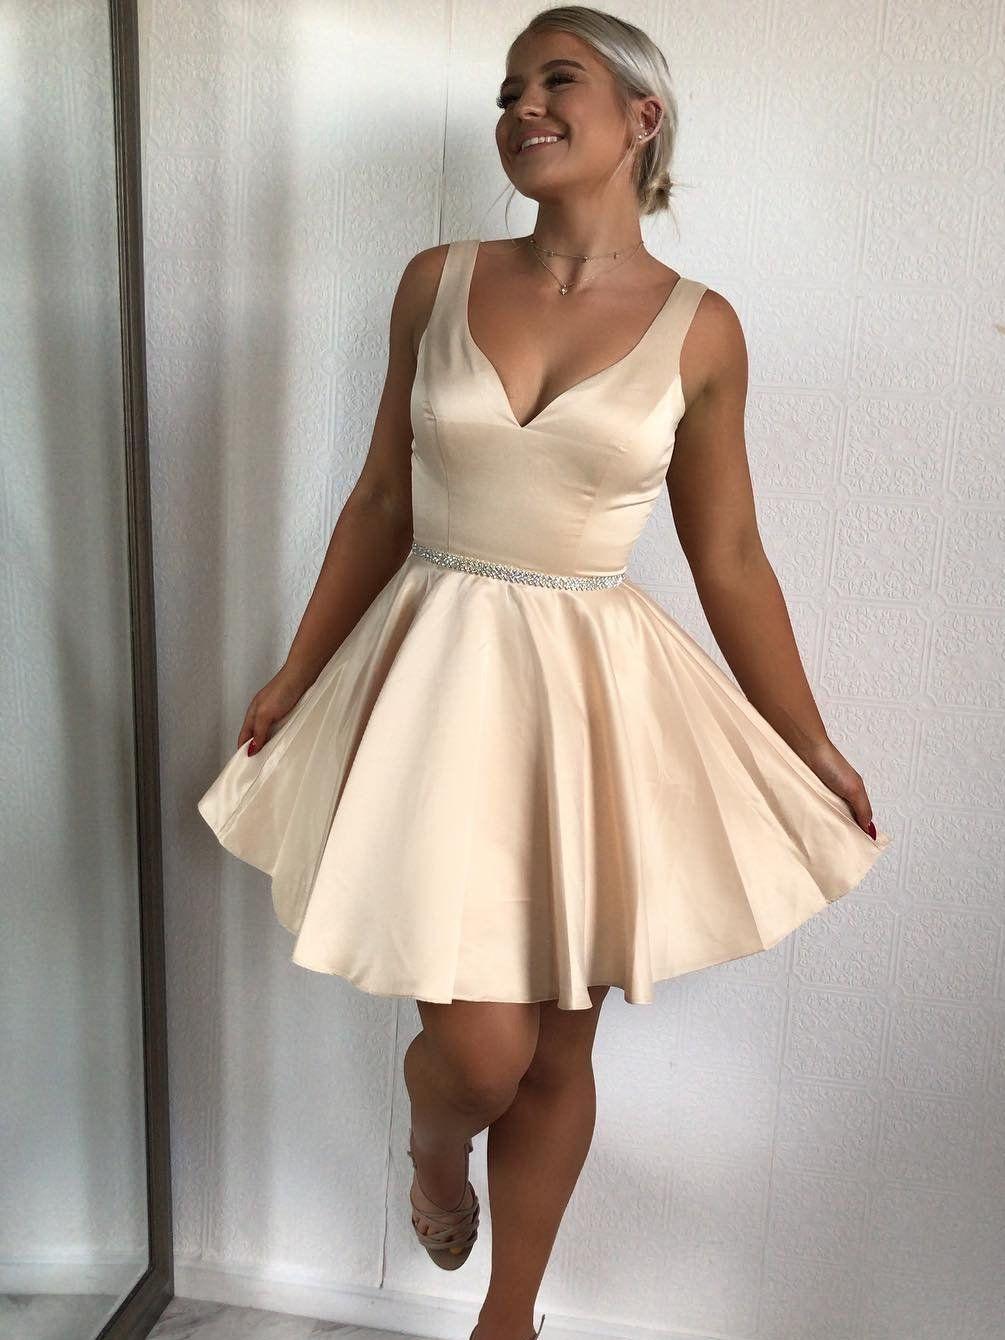 Simple Short Satin Homecoming Dresses V Neck Blush Graduation